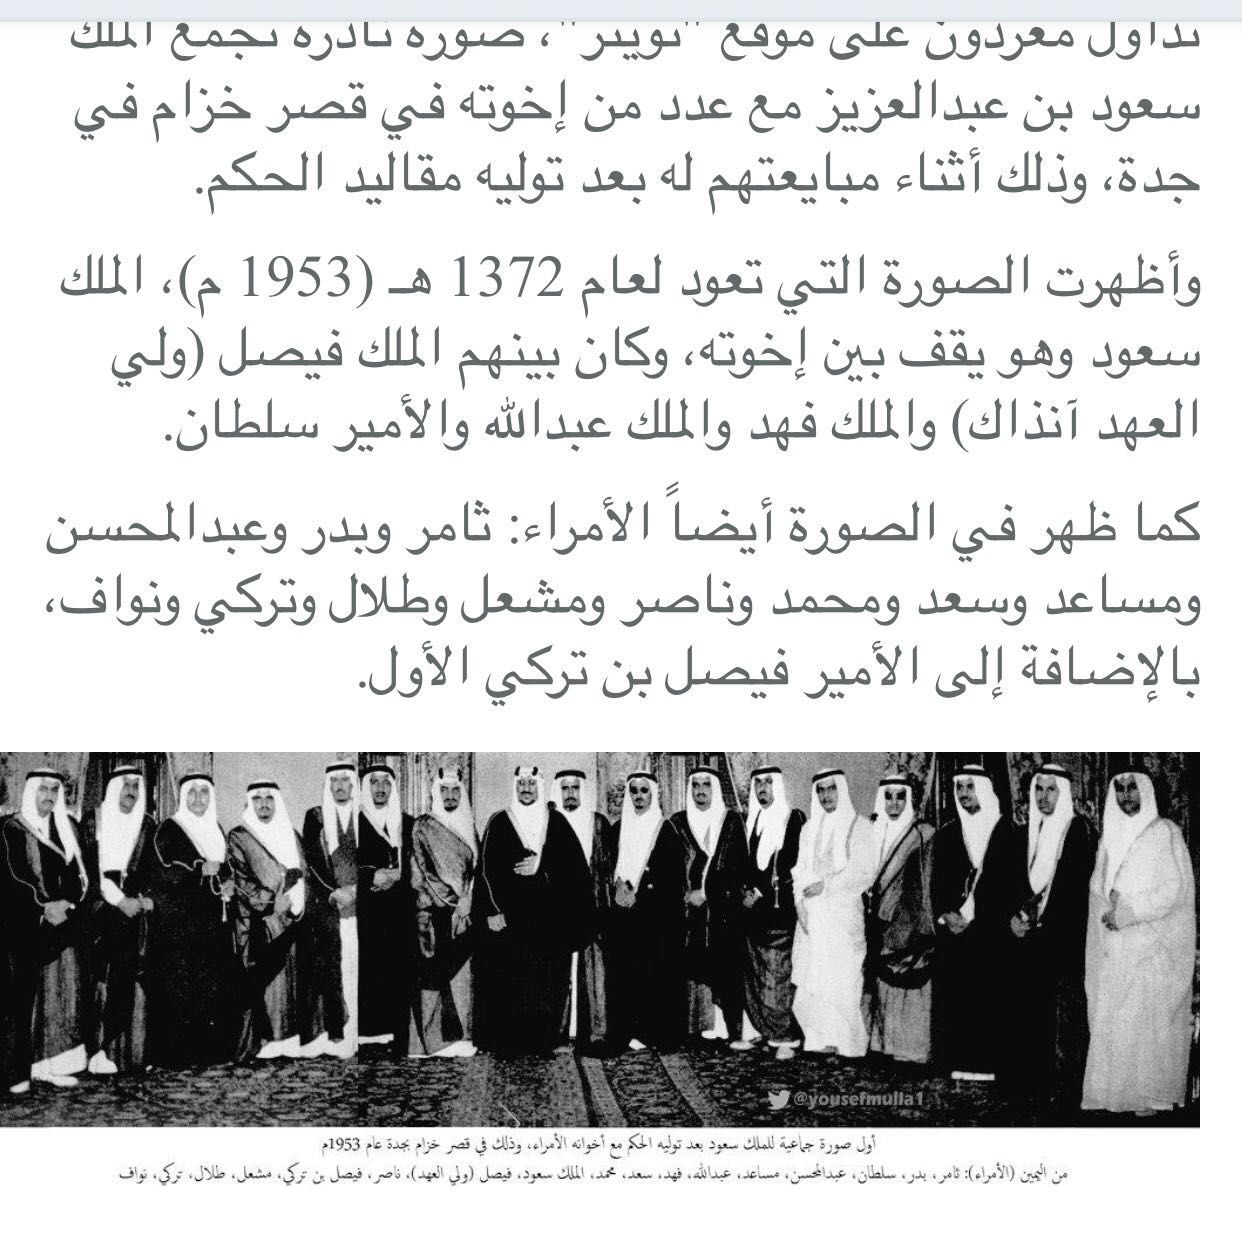 Pin By Jiji On King Saud Ben Abdulaziz Movie Posters Poster Math